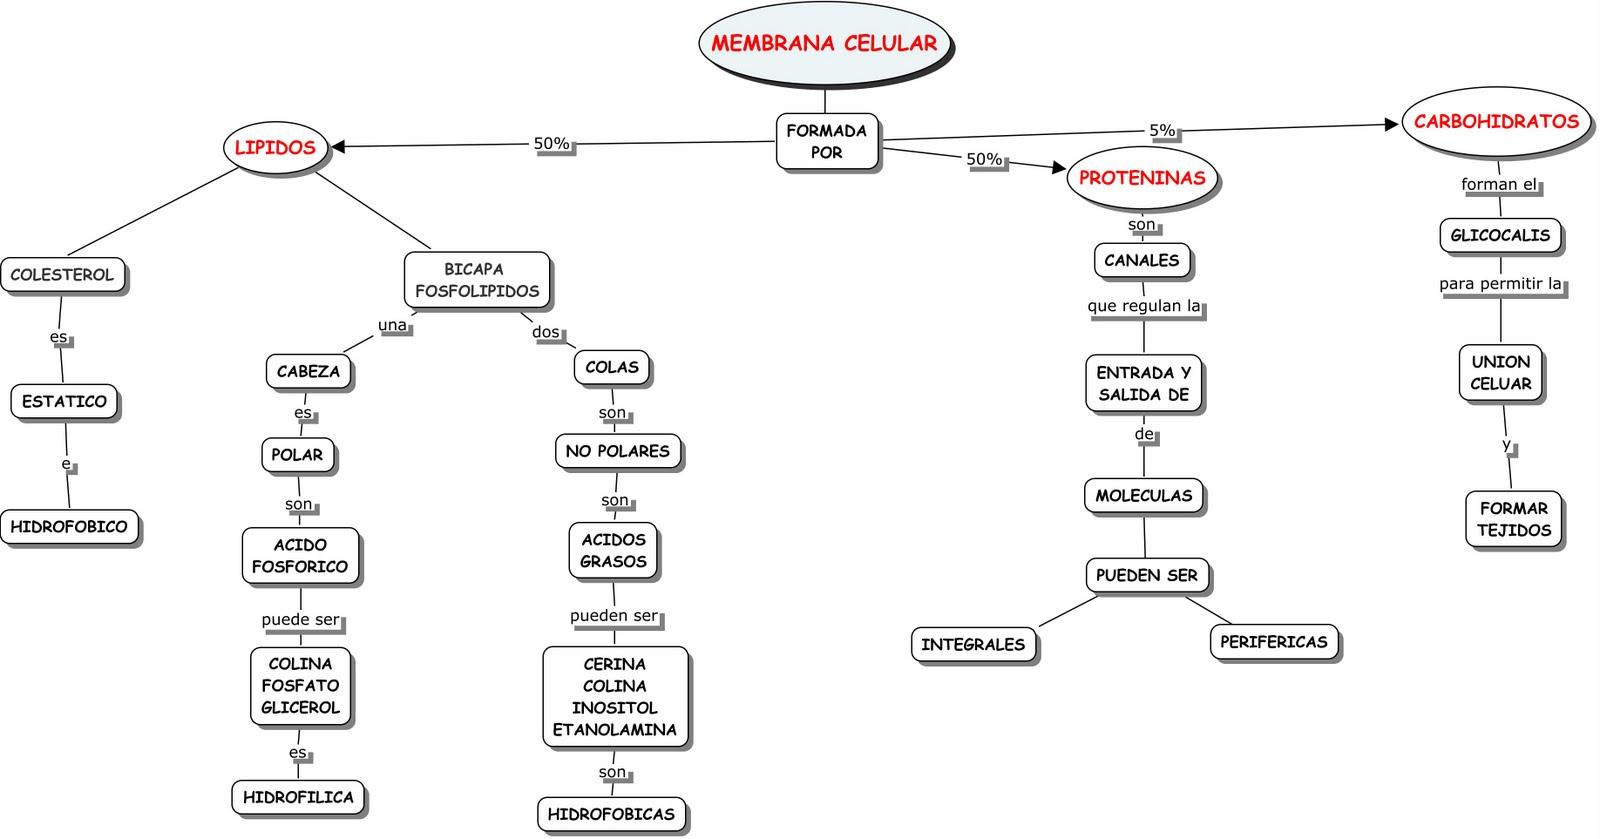 Membrana Plasmolema